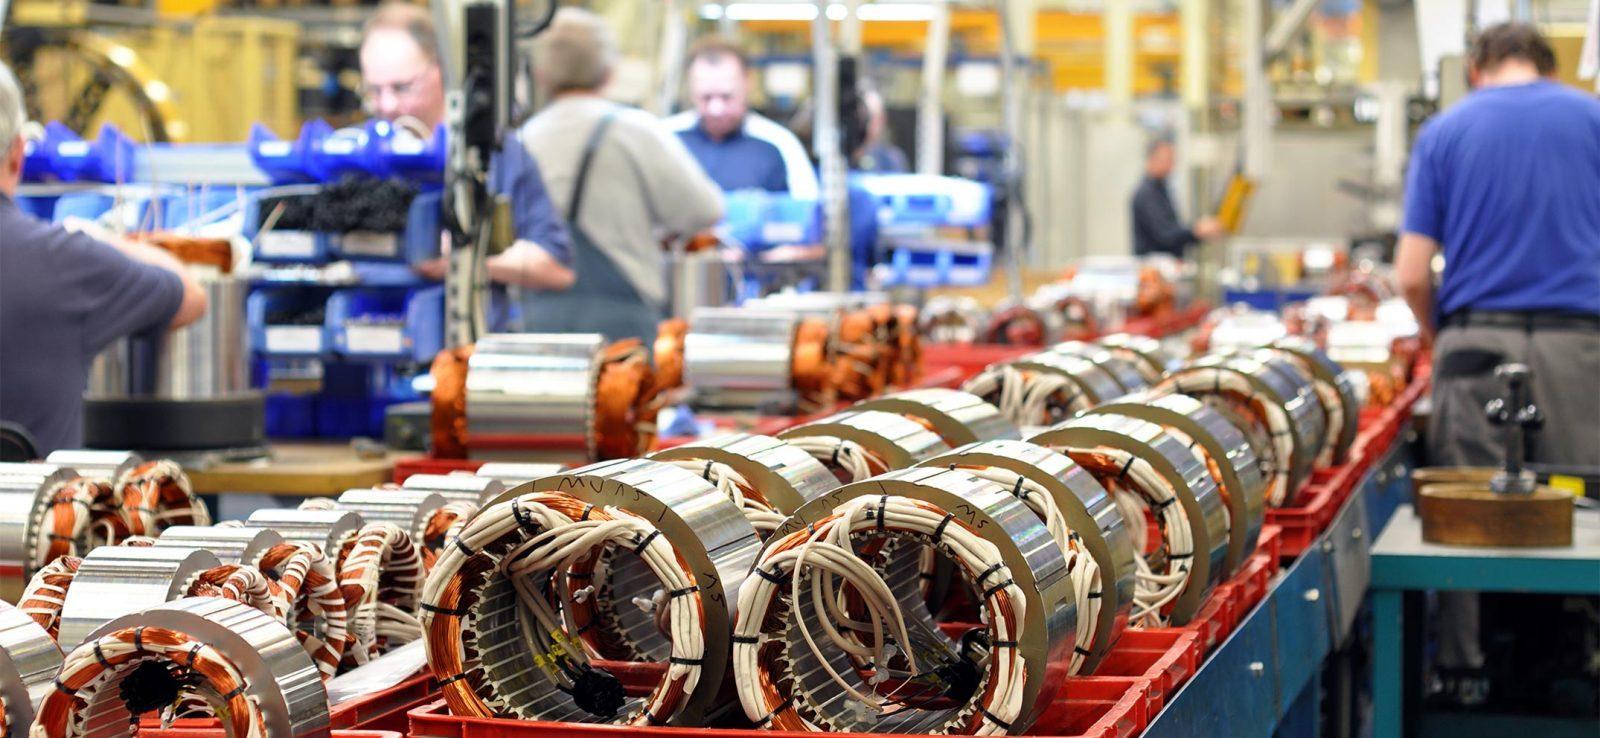 Asservimento Linee KFI | Manufacturing